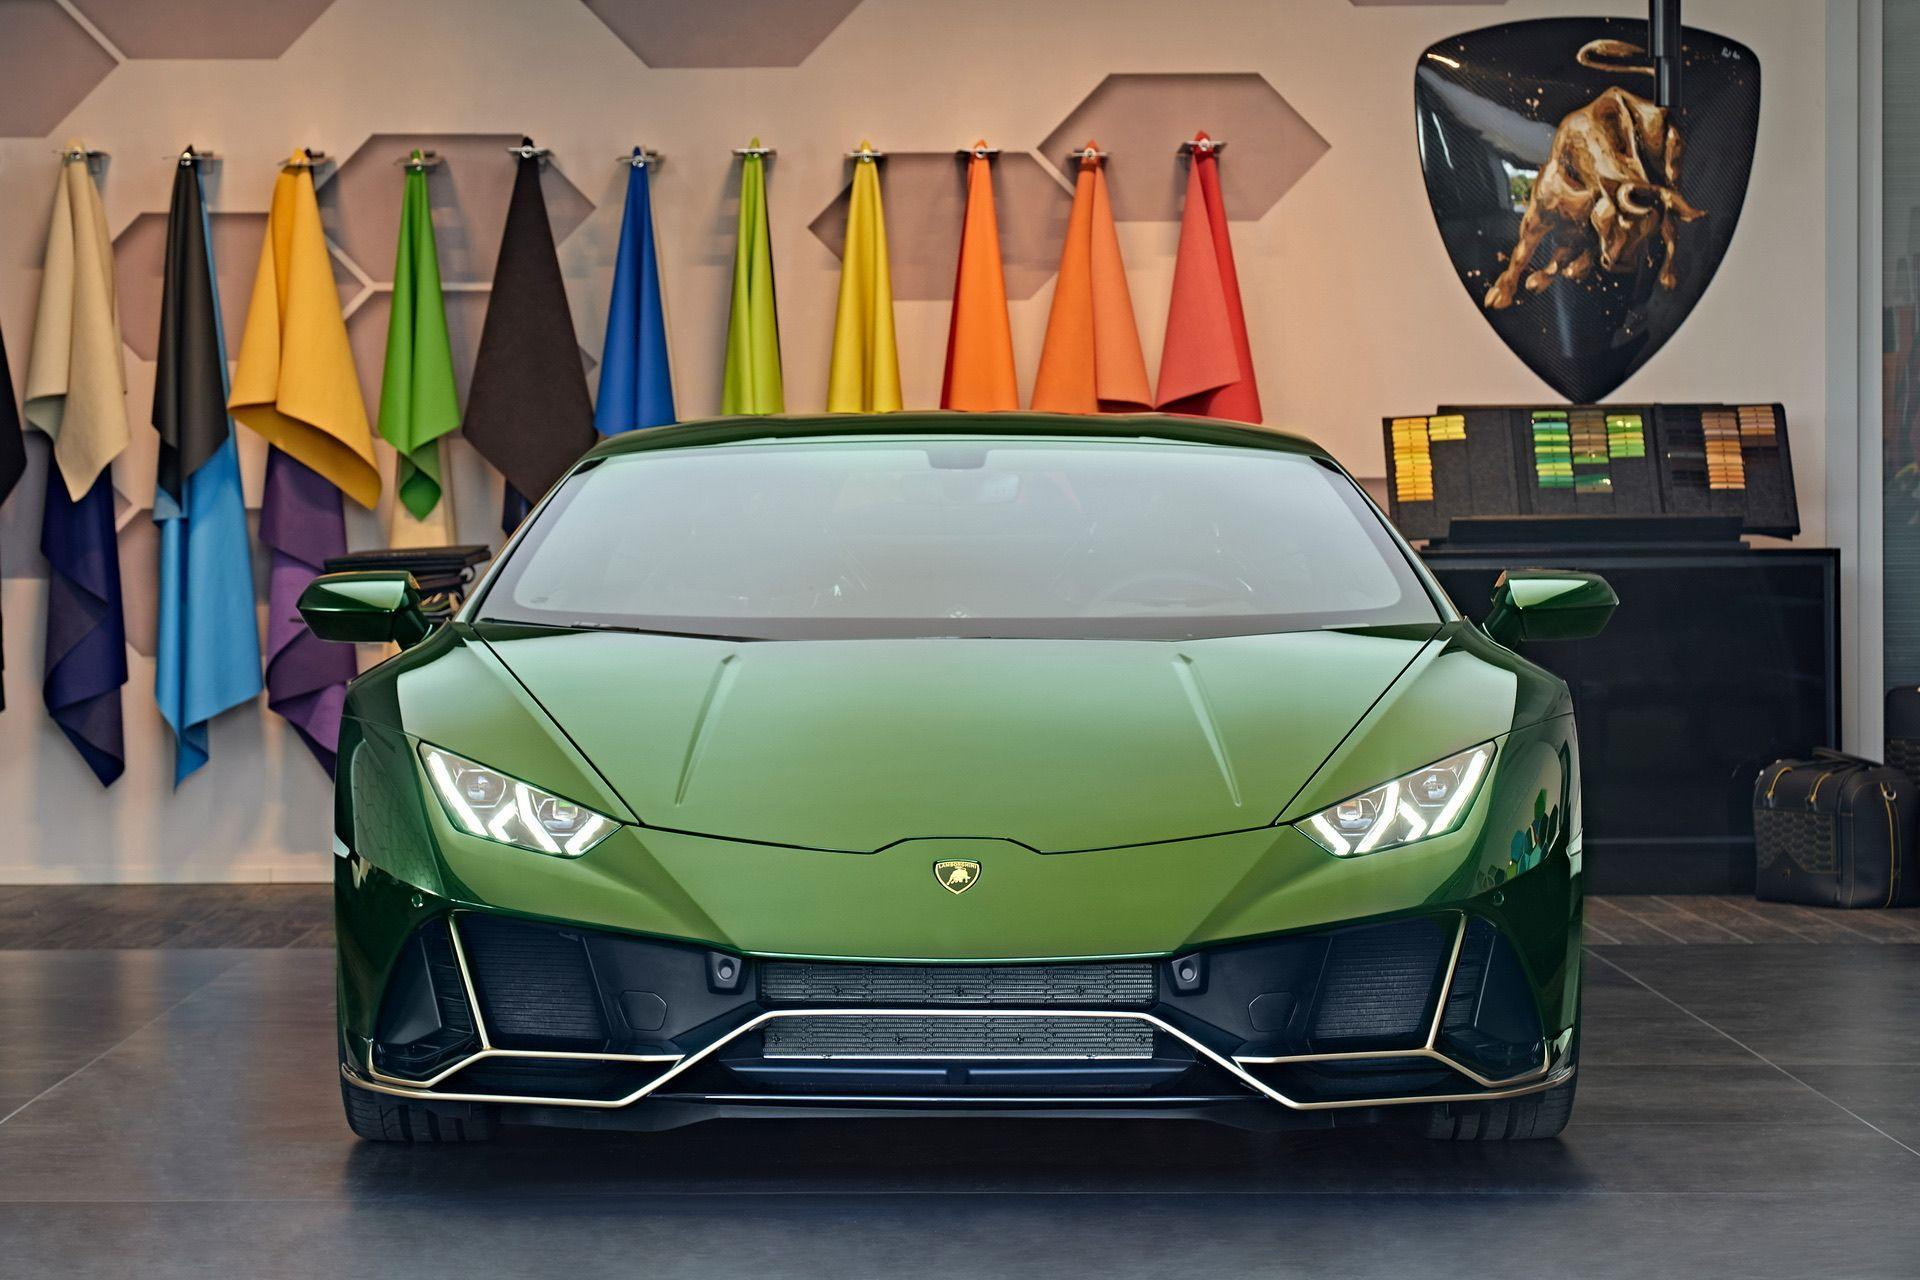 Lamborghini-Huracan-for-Mexico16_1920x1280